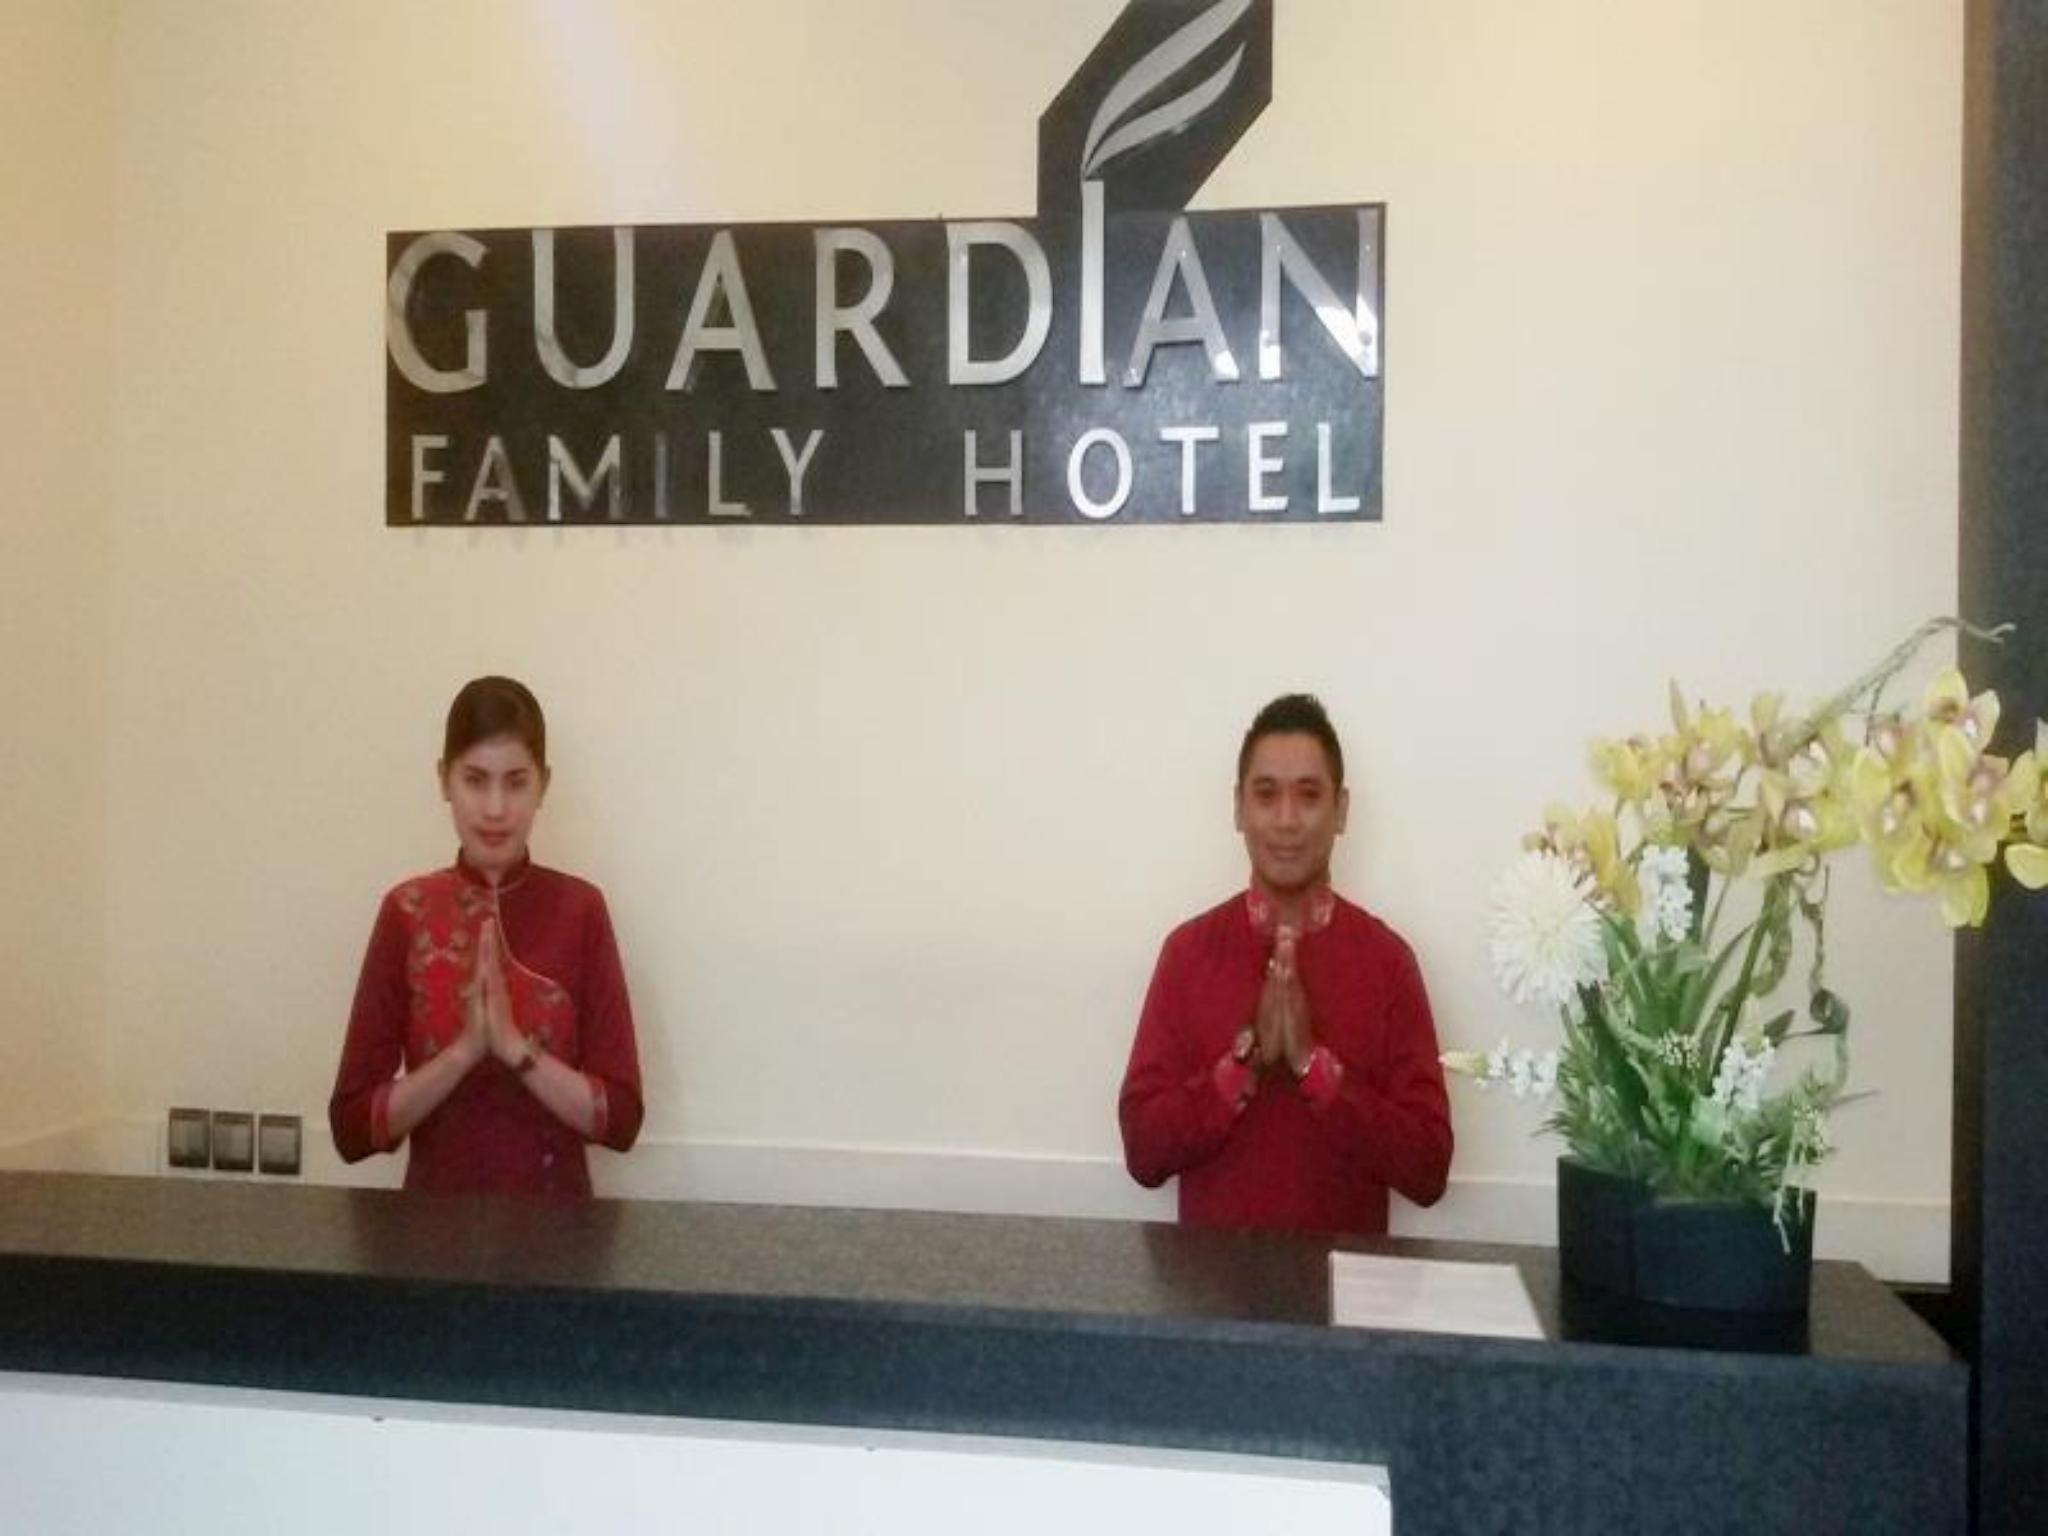 Hotel Guardian Family Hotel - Jl. Raya Basuki Rahmat Km. 7.5 In front Of Sorong Airport - Irian Jaya/Papua